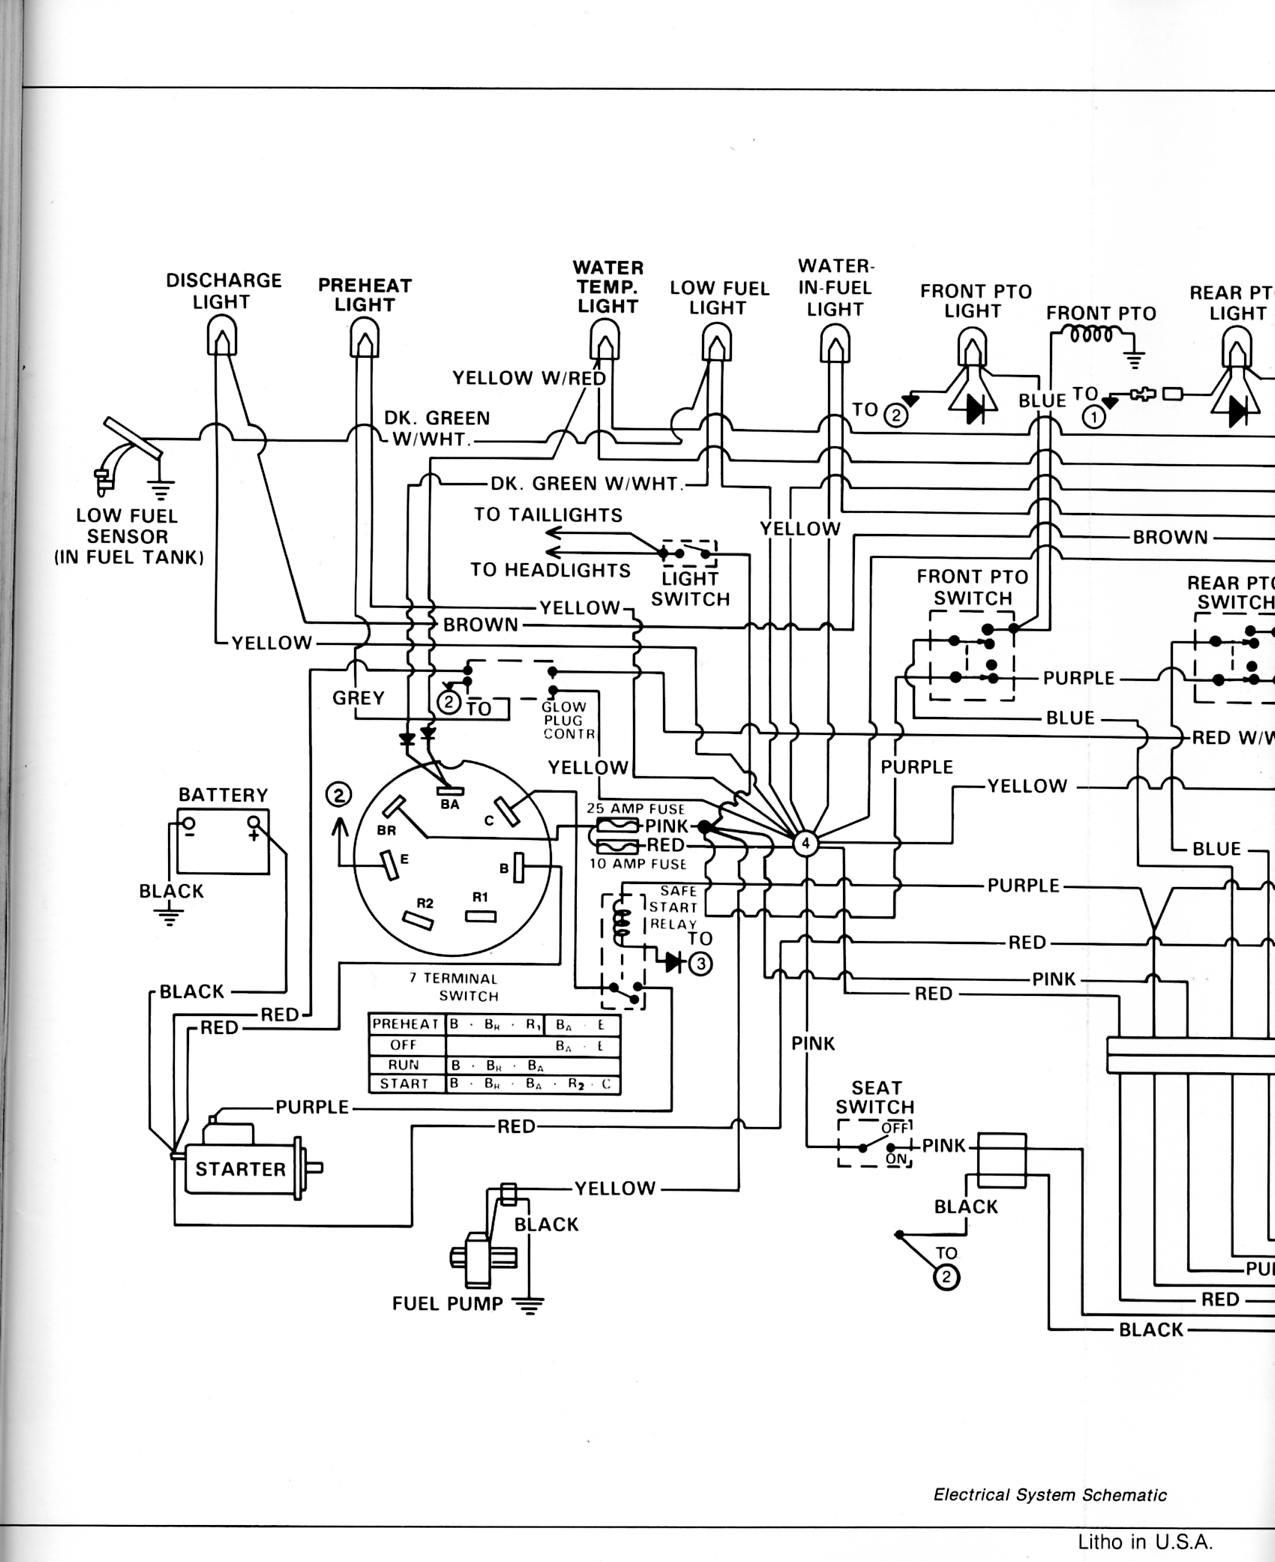 30 Fresh Case 1845c Starter Wiring Diagram